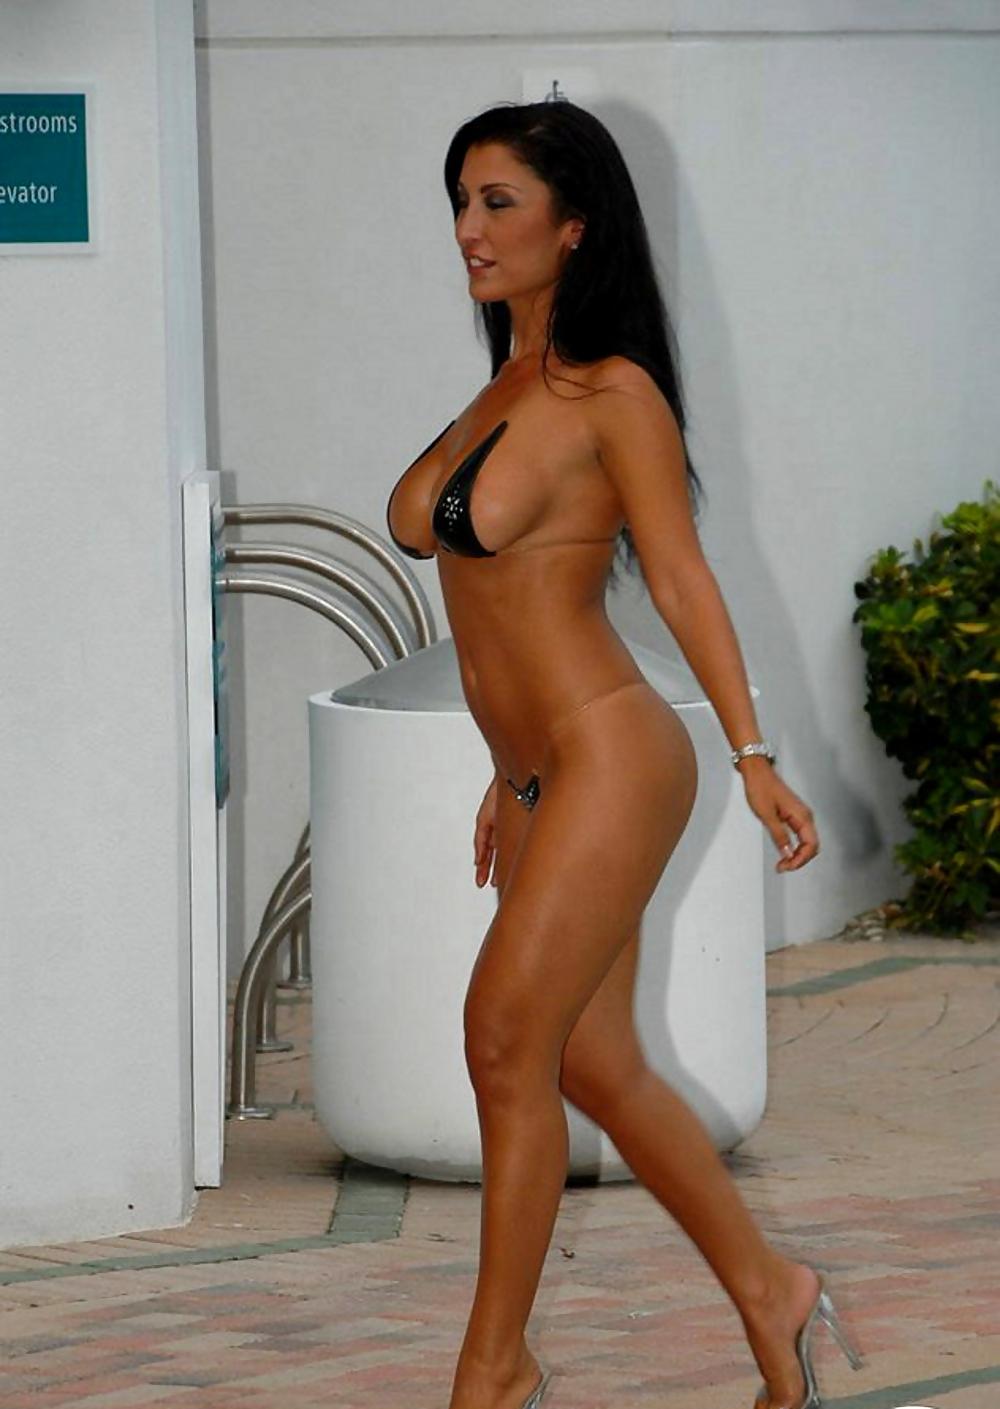 bikini contest Datona